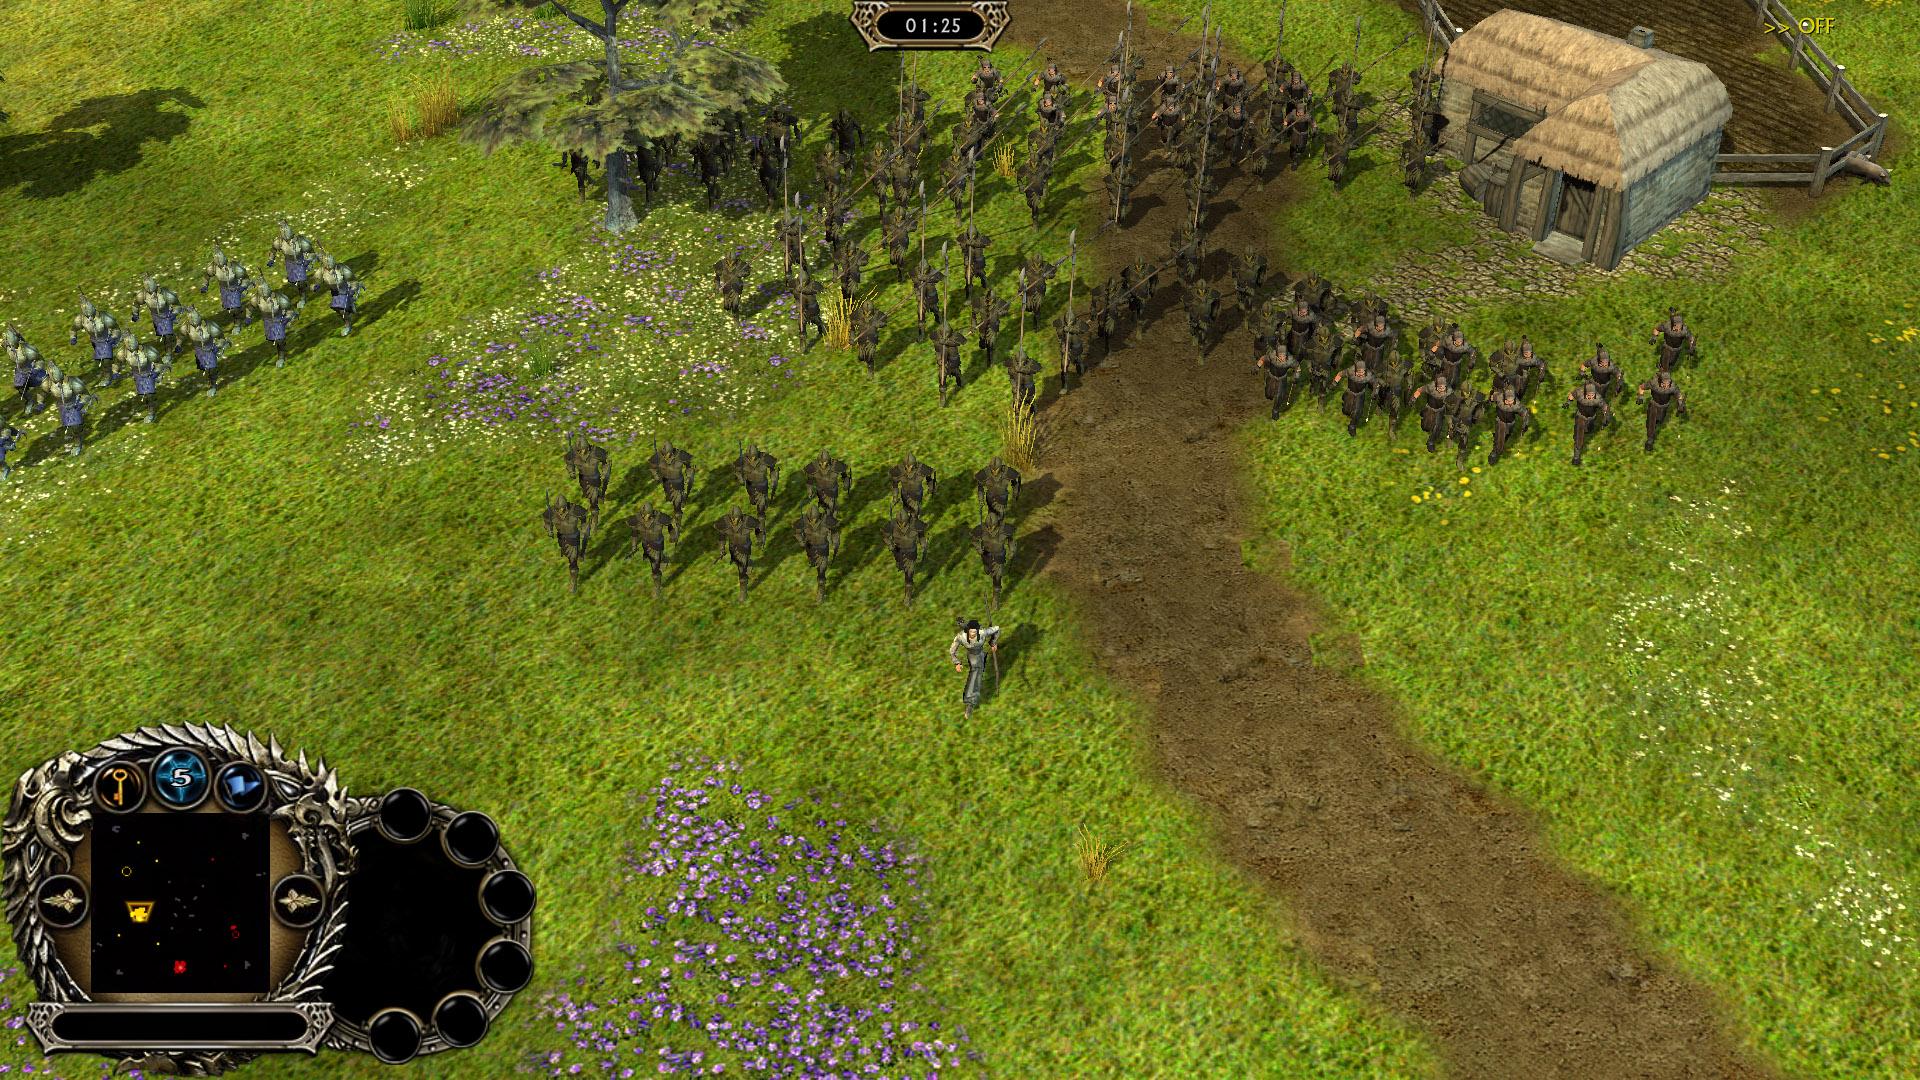 The Elder Scrolls: The Battle for Tamriel